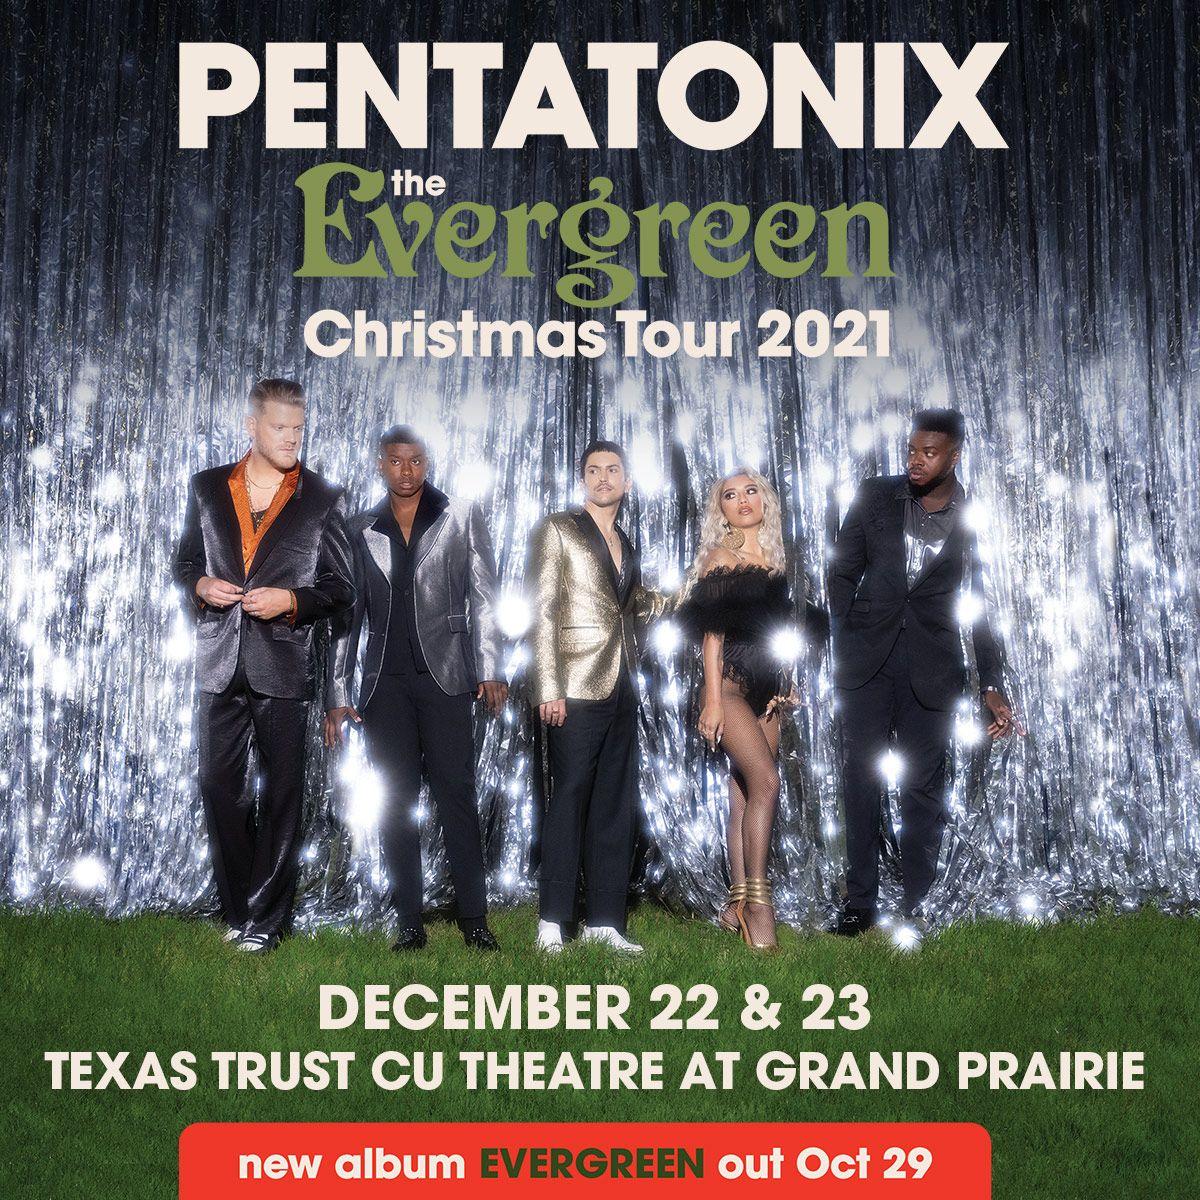 Pentatonix   Texas Trust CU Theatre, 12/22/21 & 12/23/21